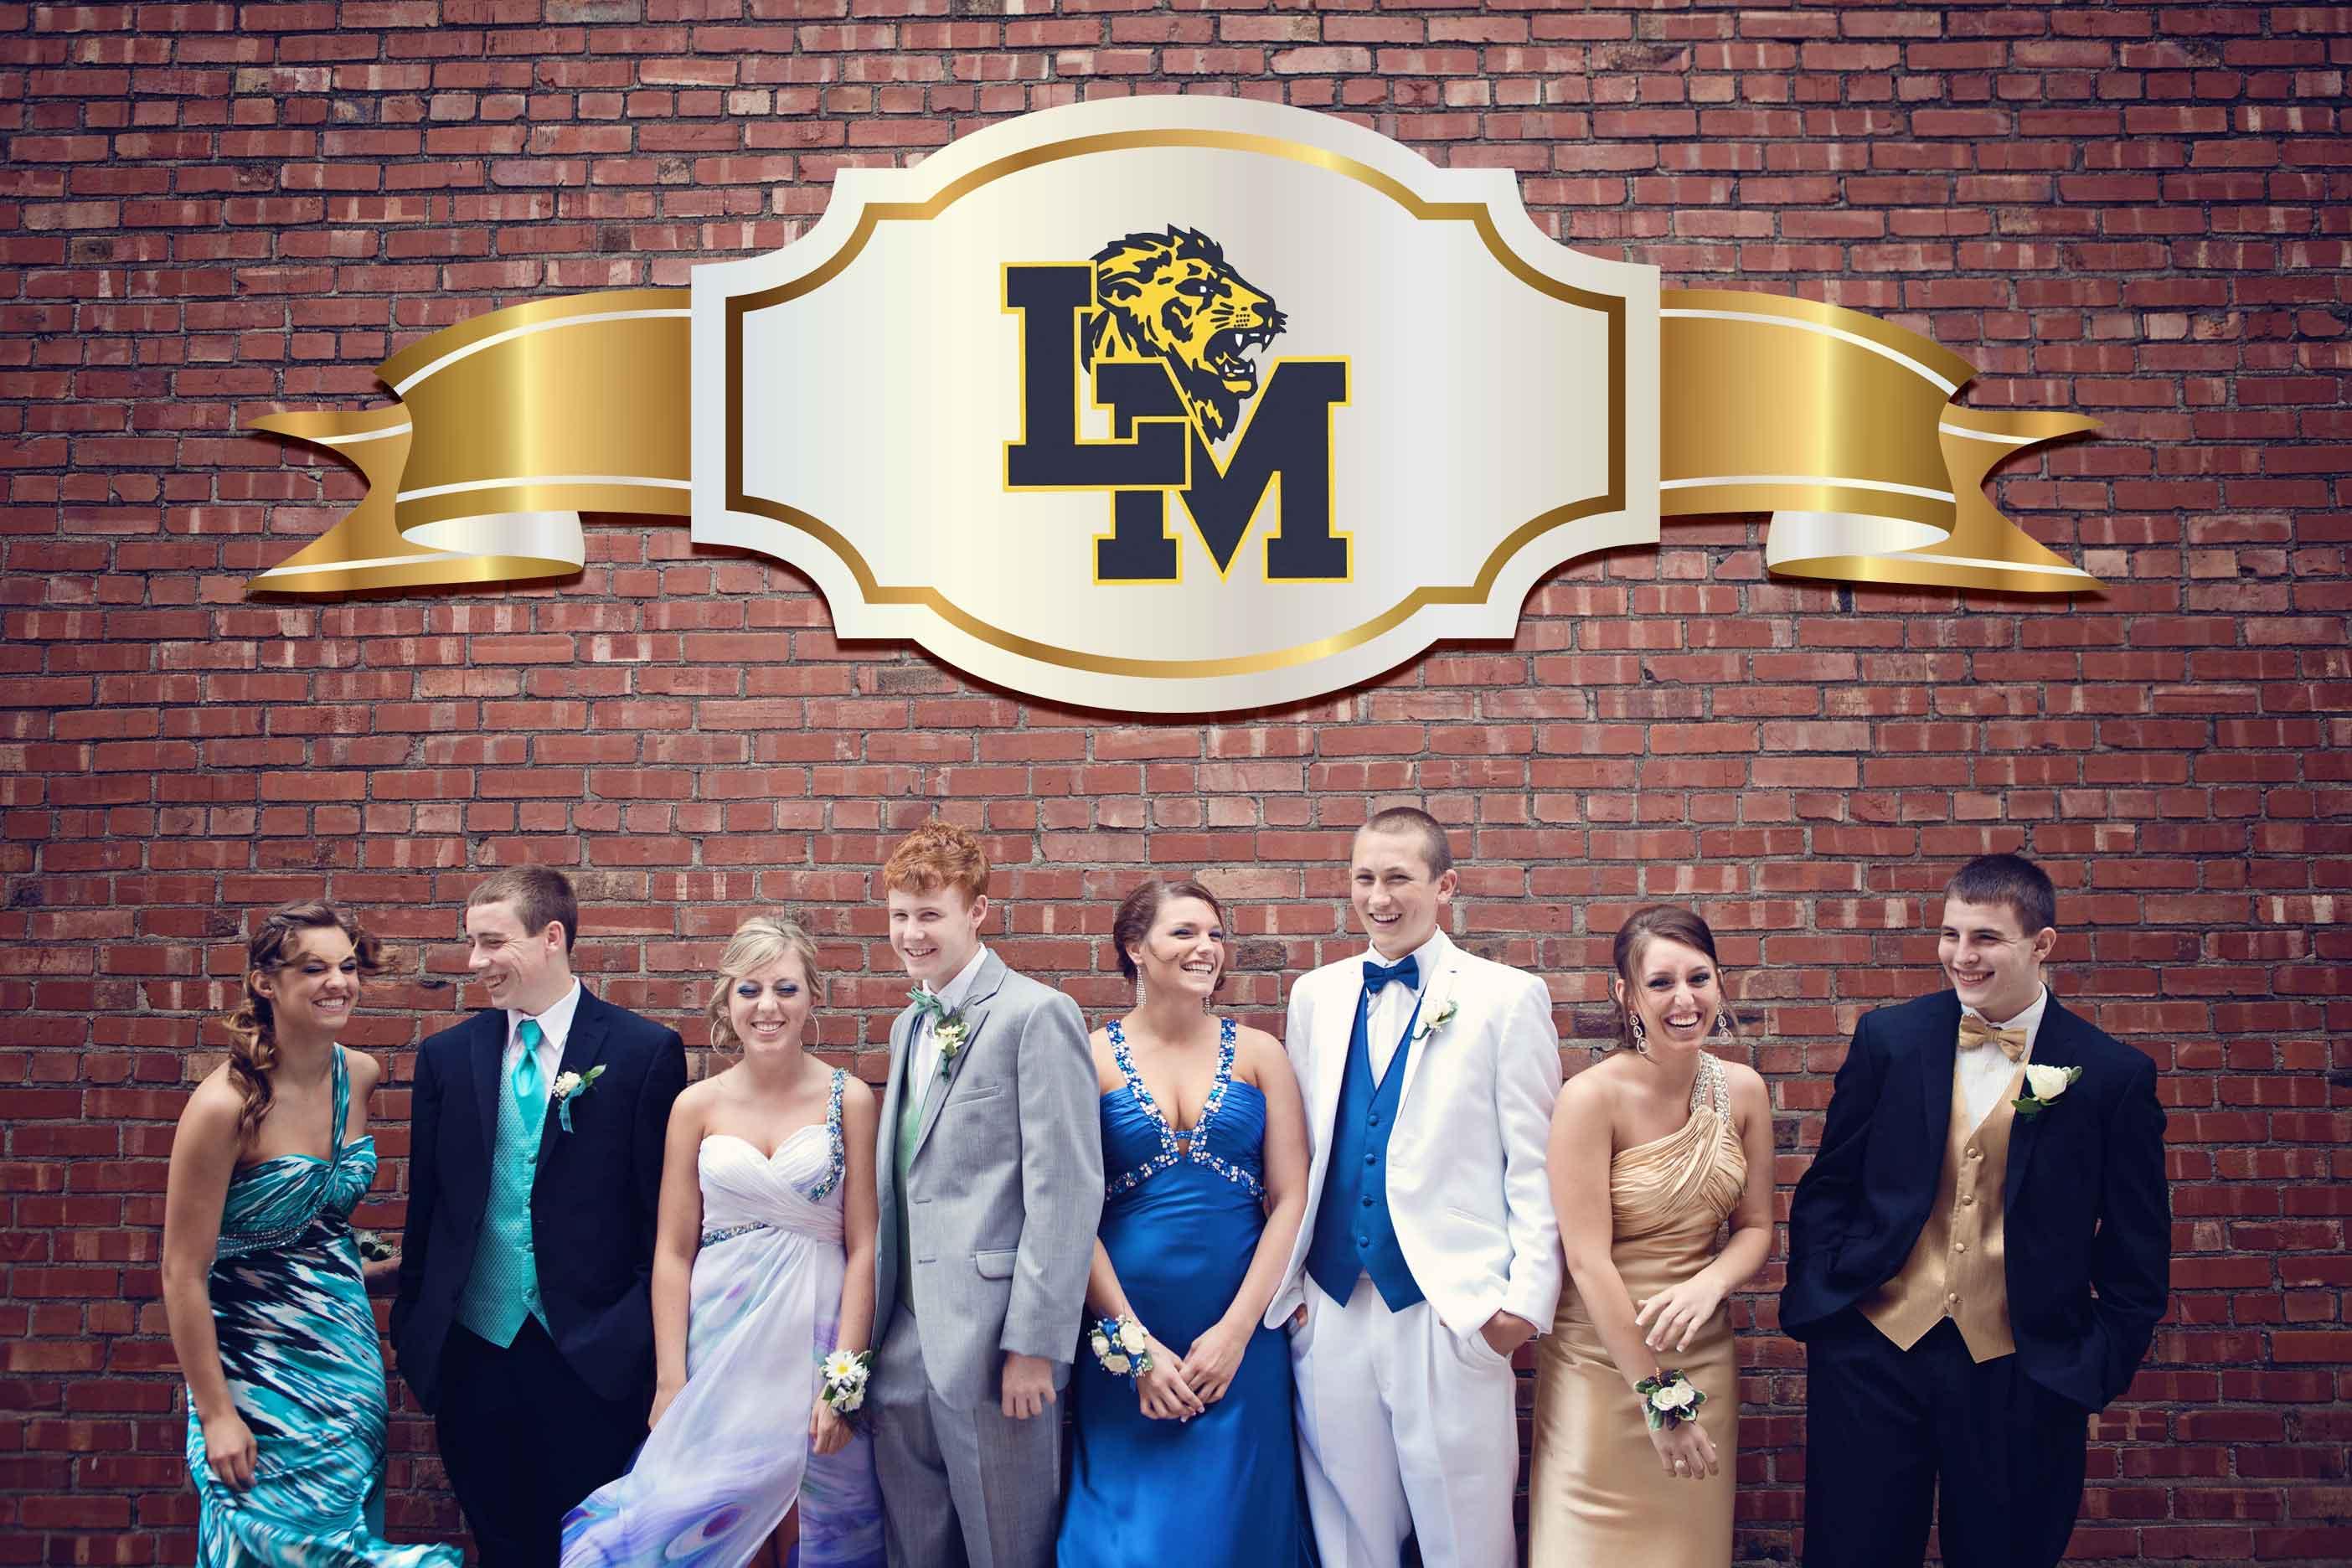 lower moreland high school prom